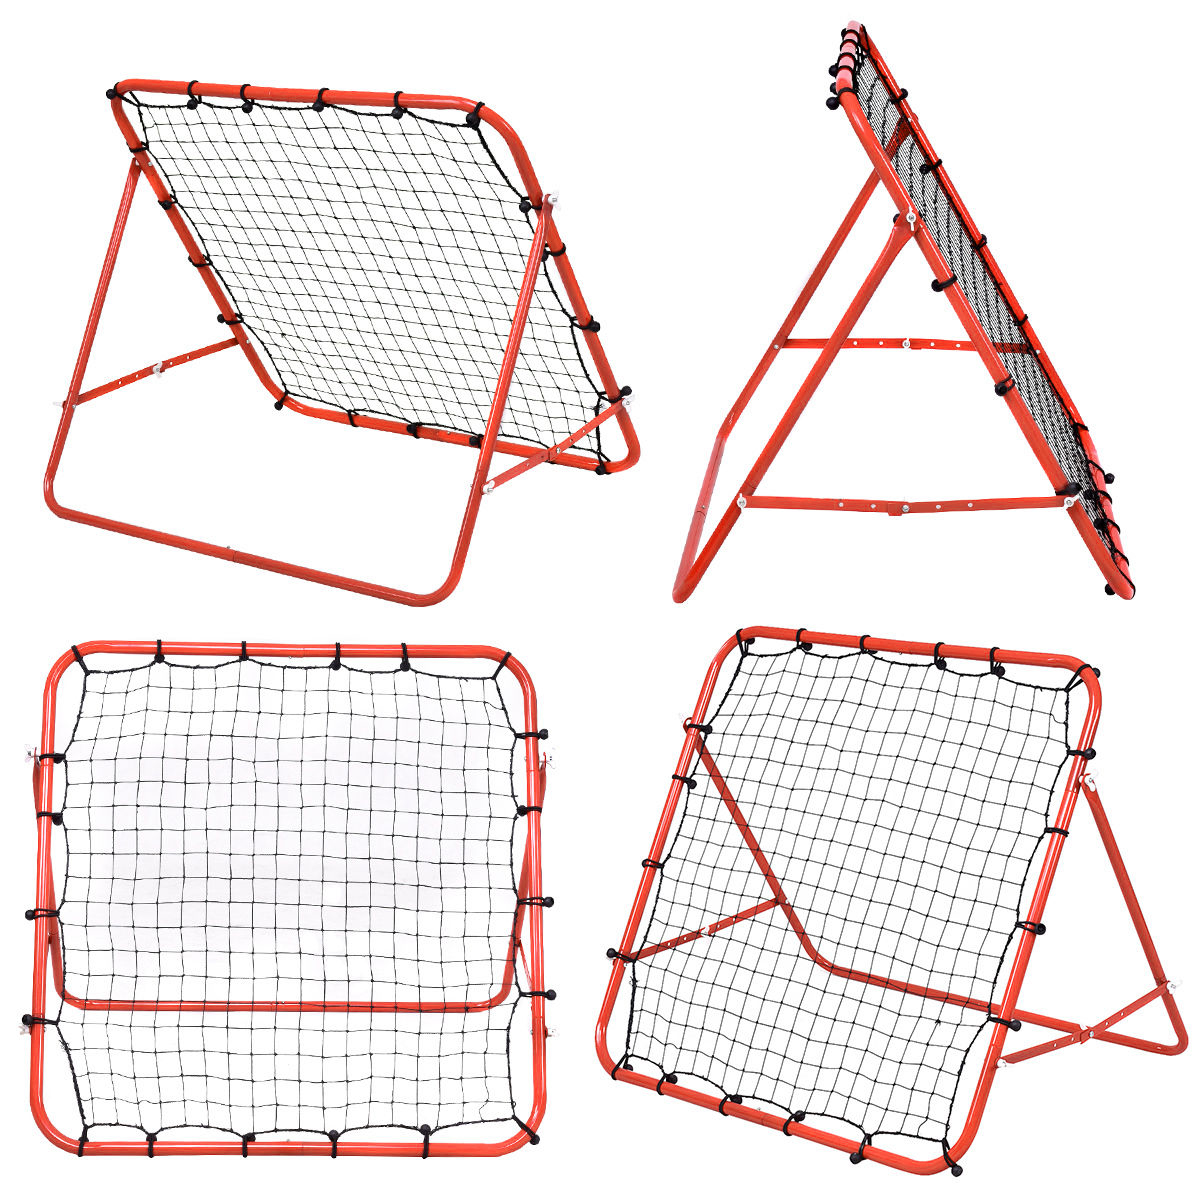 Soccer Football Rebound Target Mesh Net Adjustable Kickback Soccer Target Goal Baseball Soccer Training Aid Tool soccer skills training